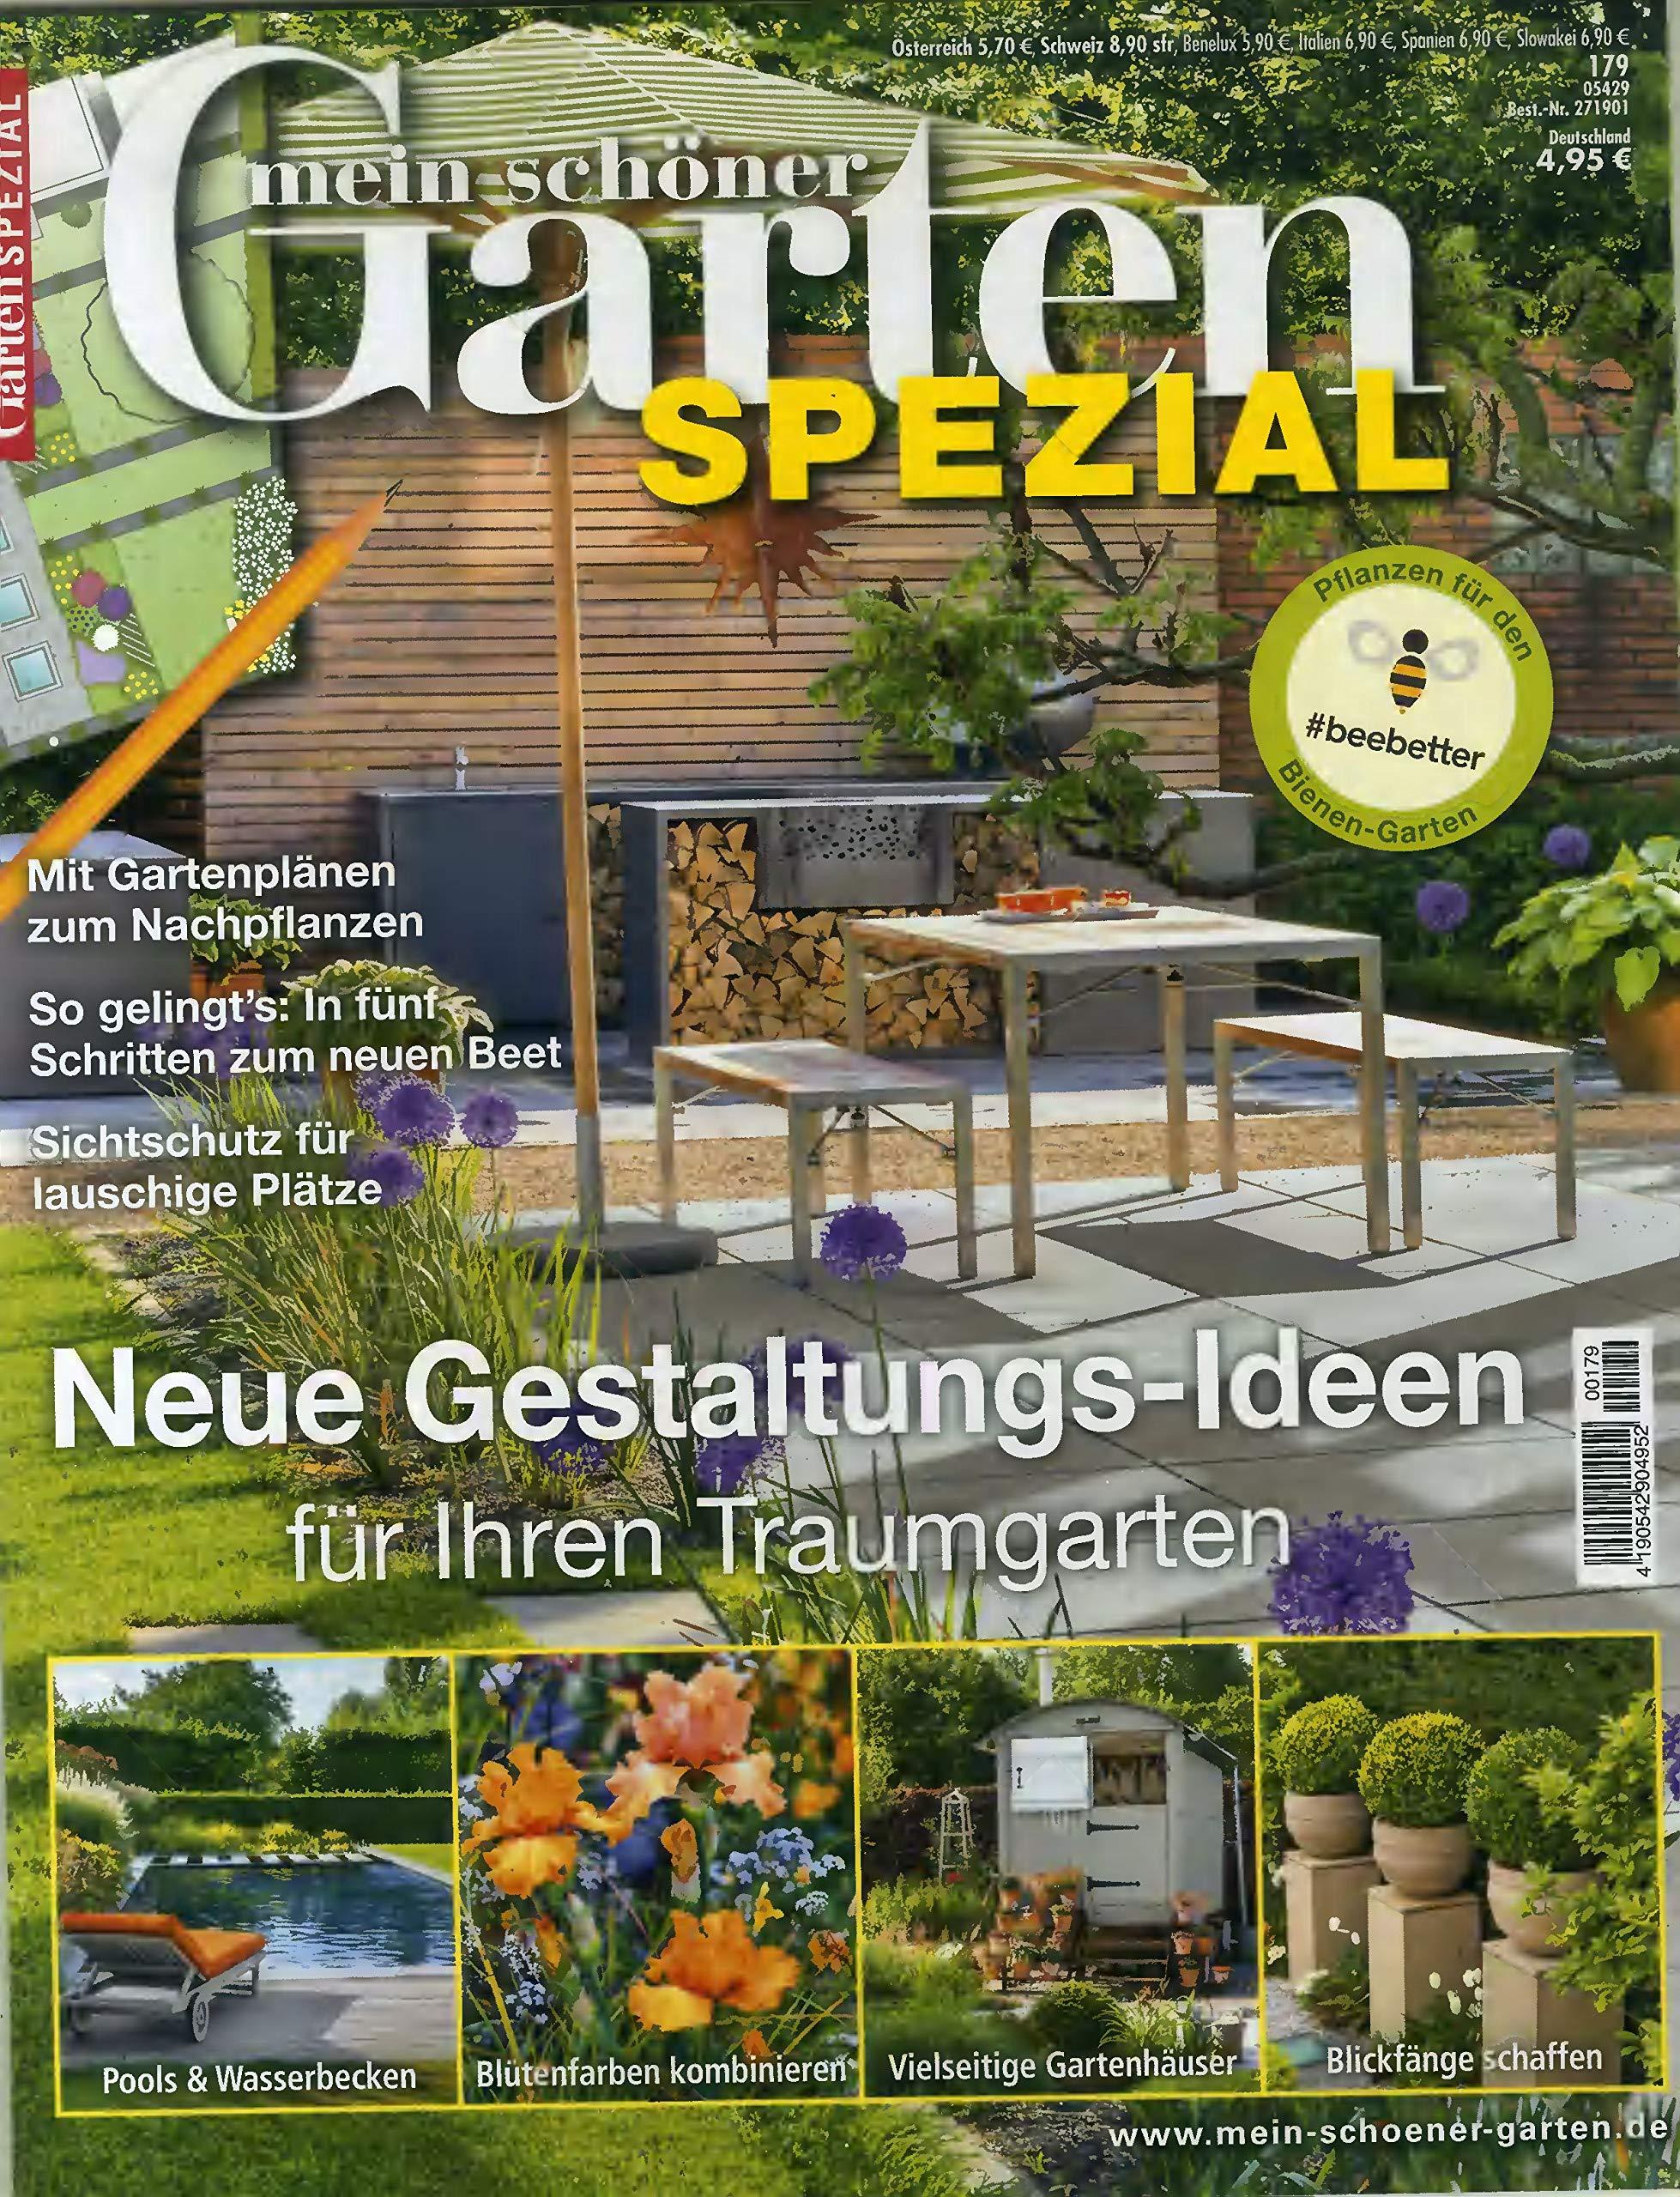 Mein Schoner Garten Spezial 179 2019 Neue Gestaltungs Ideen